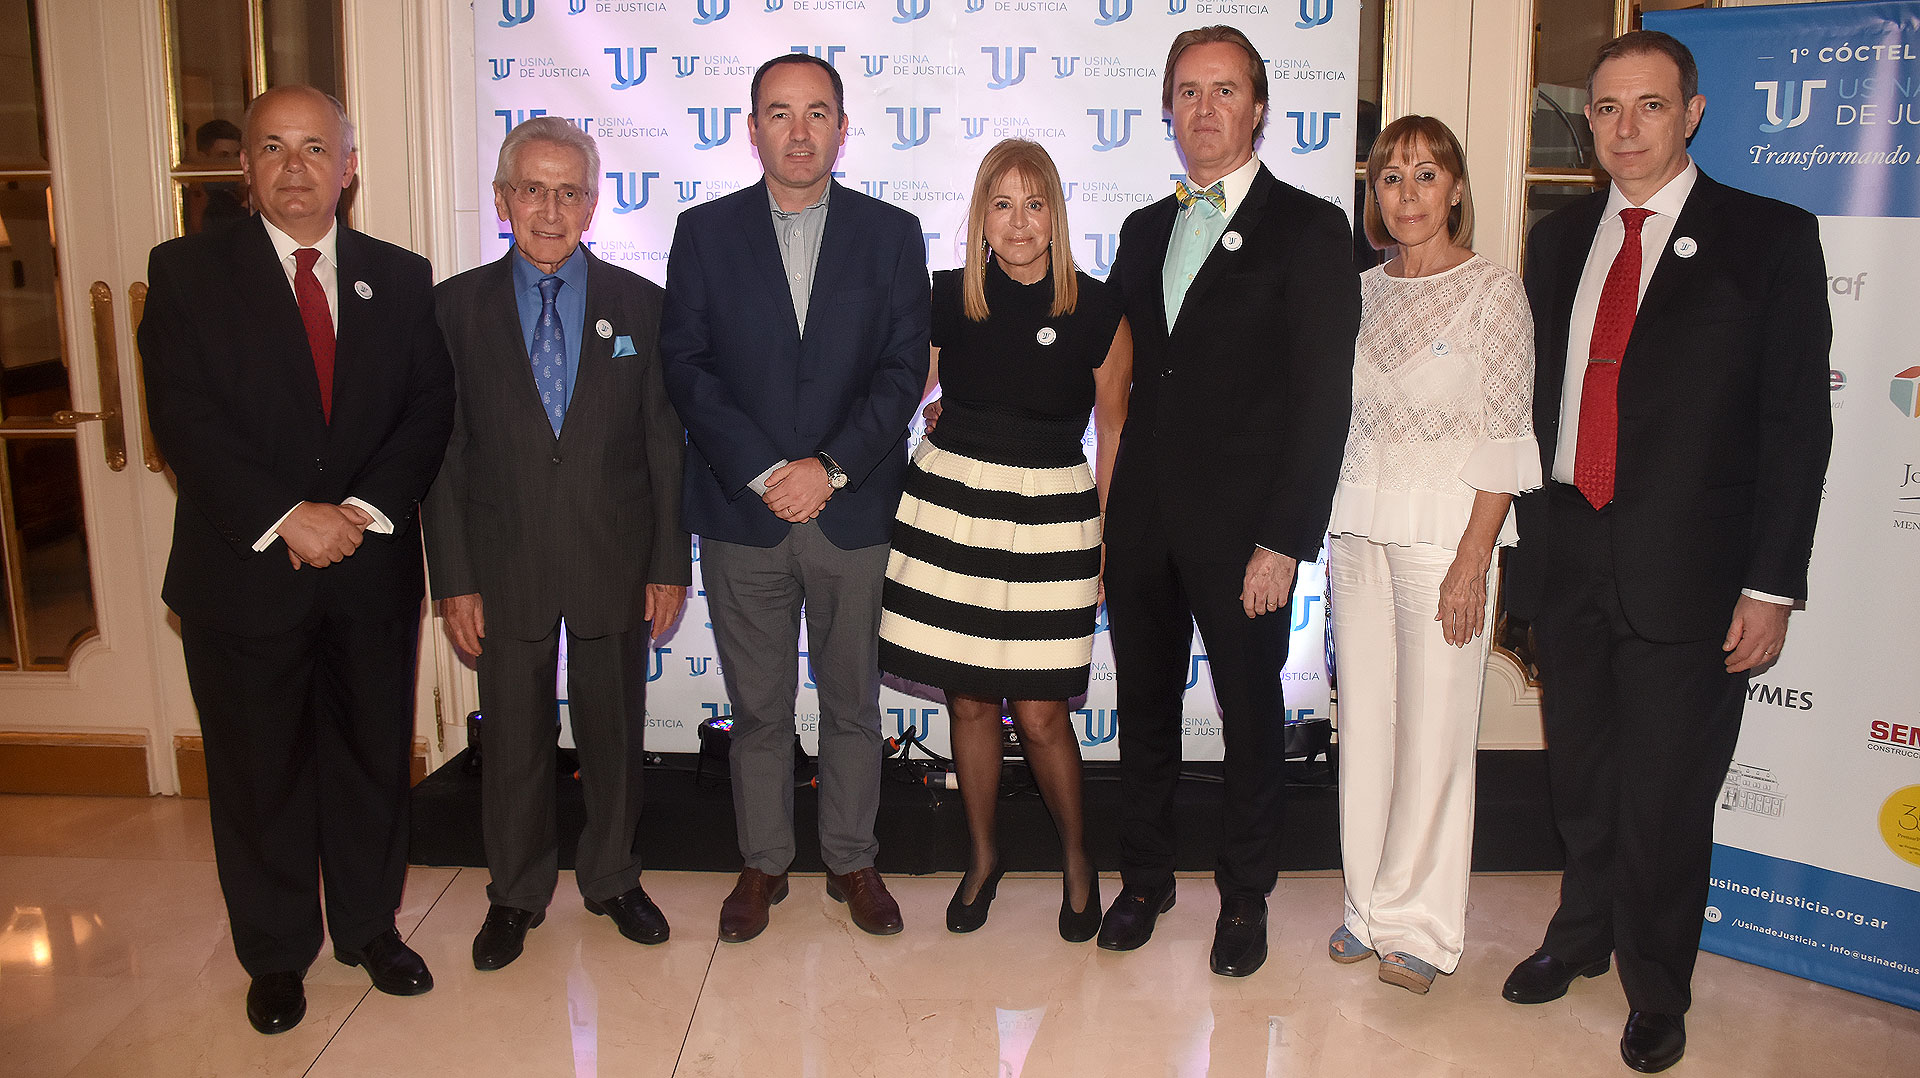 Alejandro Fargosi, Marcos Aguinis, el senador Lucas Fiorini, Diana Cohen Agrest, Martín Etchegoyen Lynch, Marcela Dal Verme y Franklin Rawson